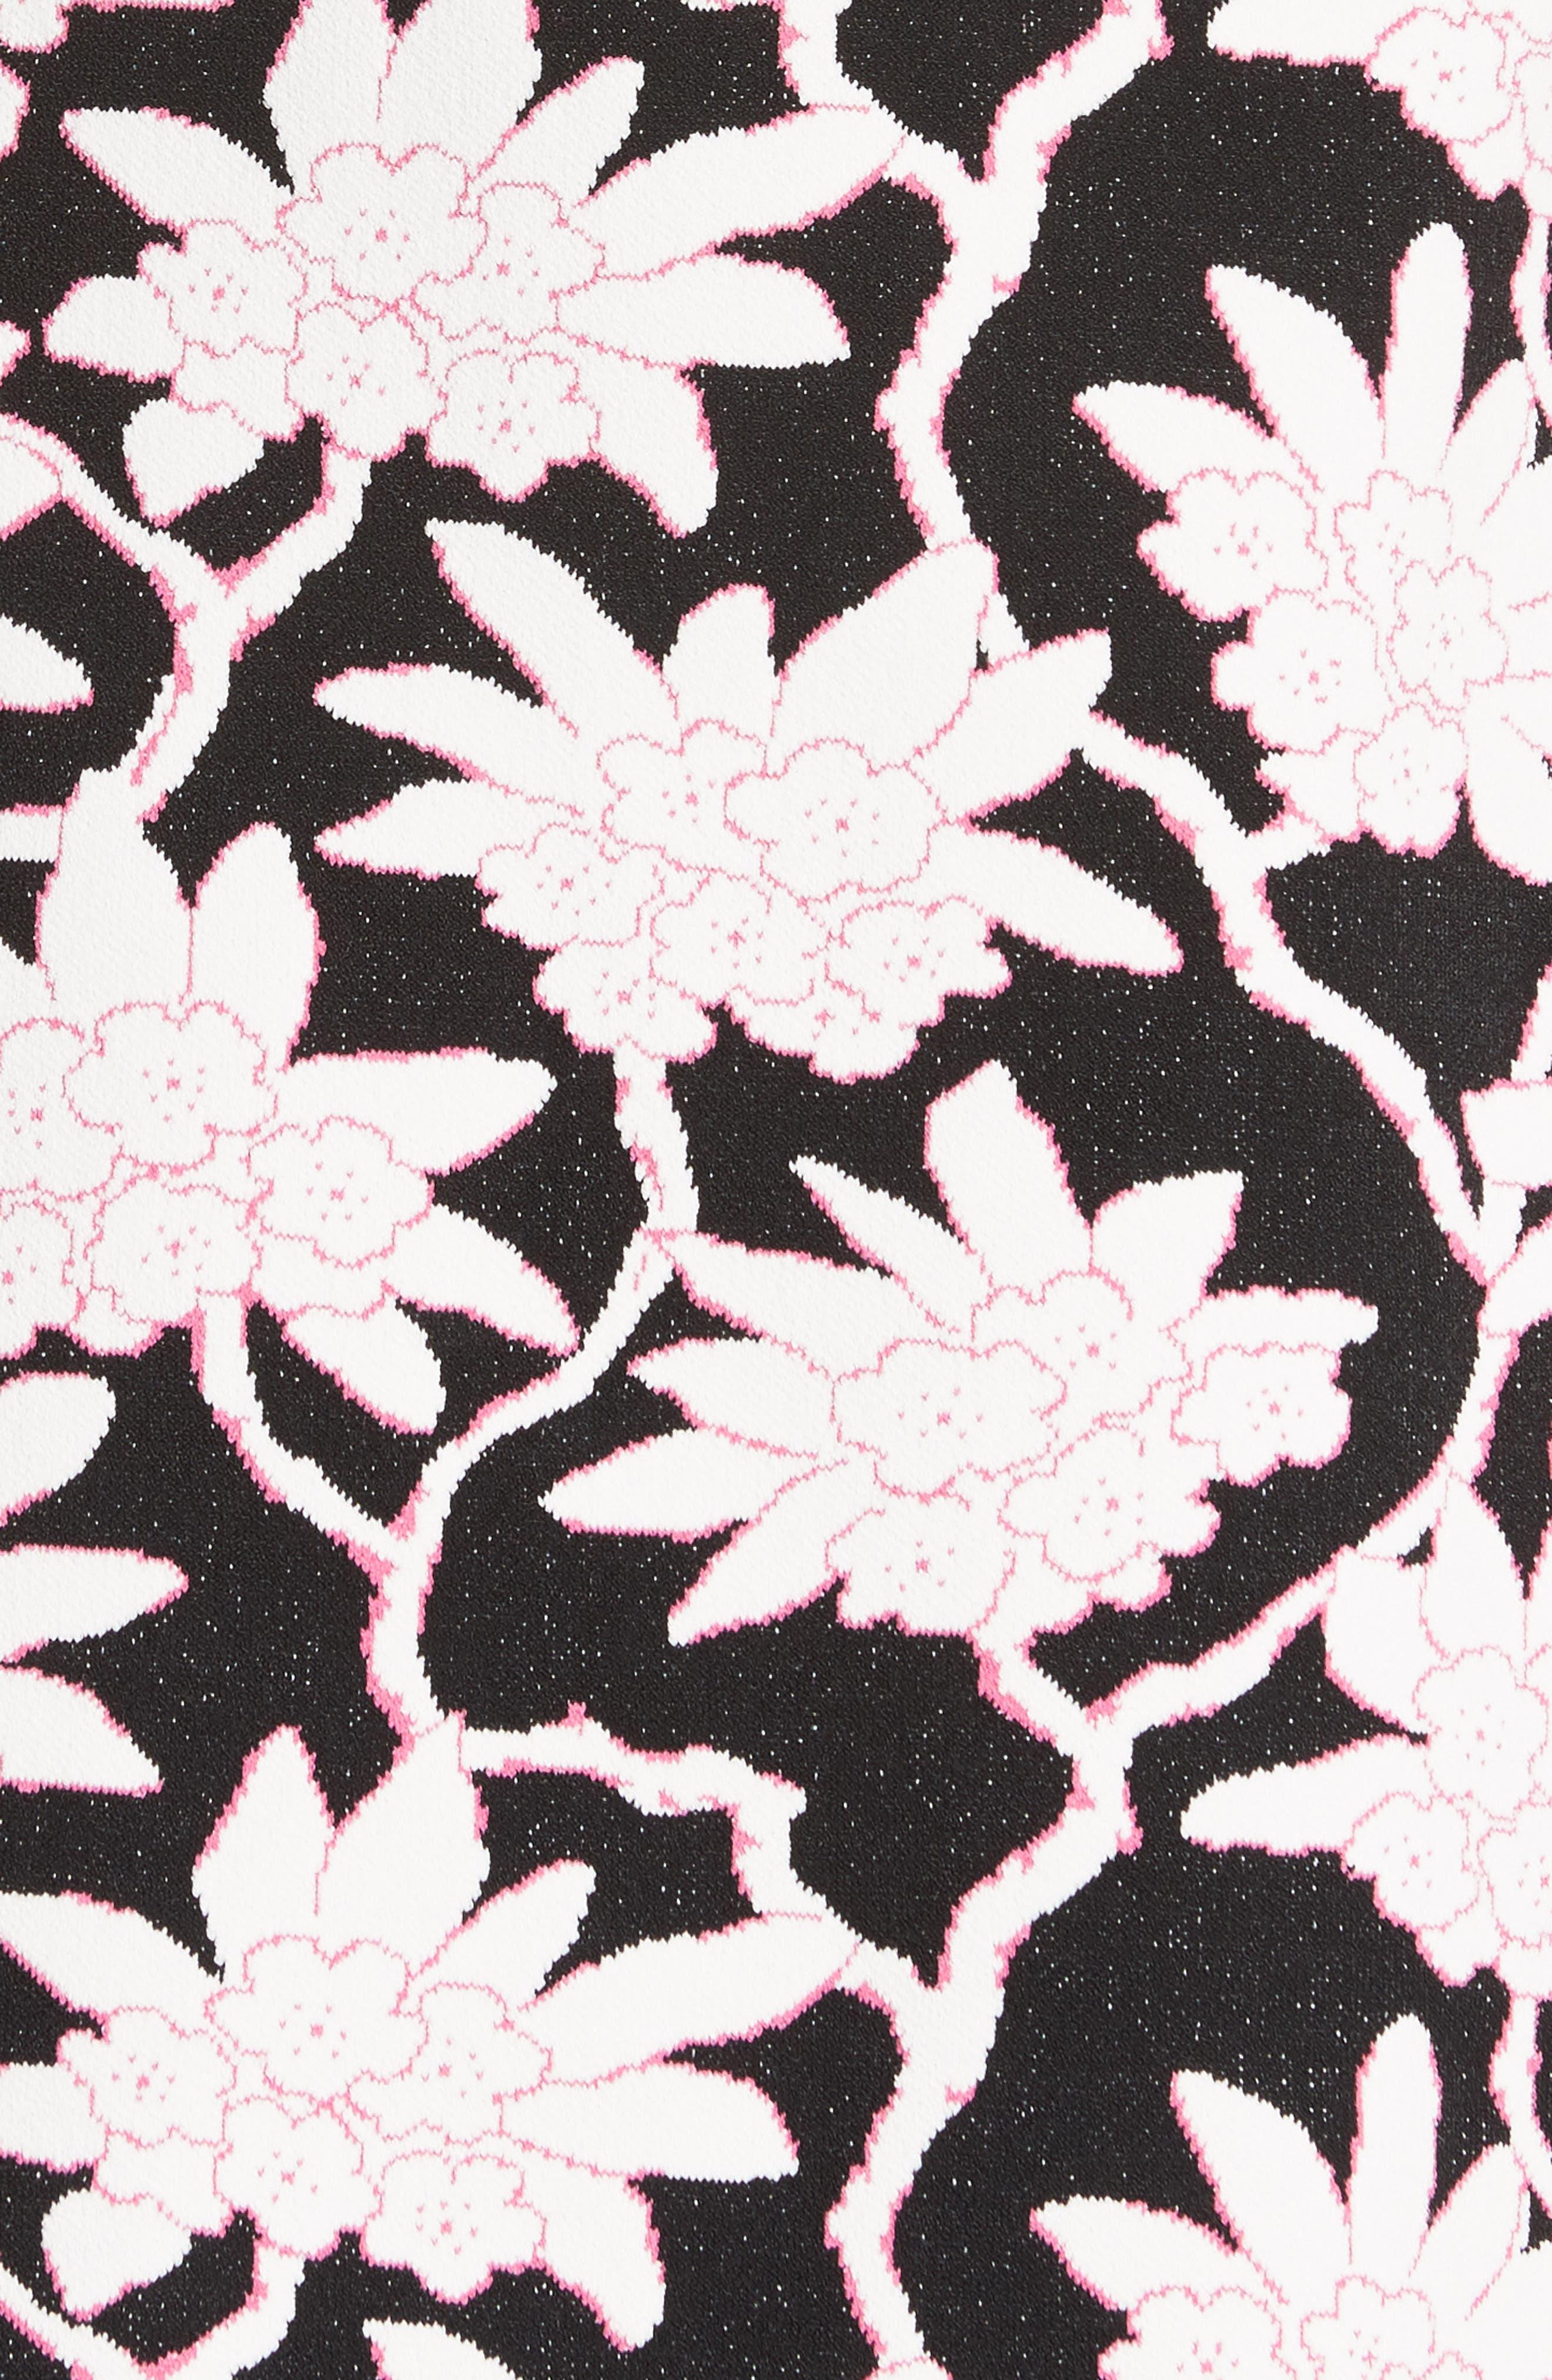 Rhododendron Jacquard Dress,                             Alternate thumbnail 5, color,                             001